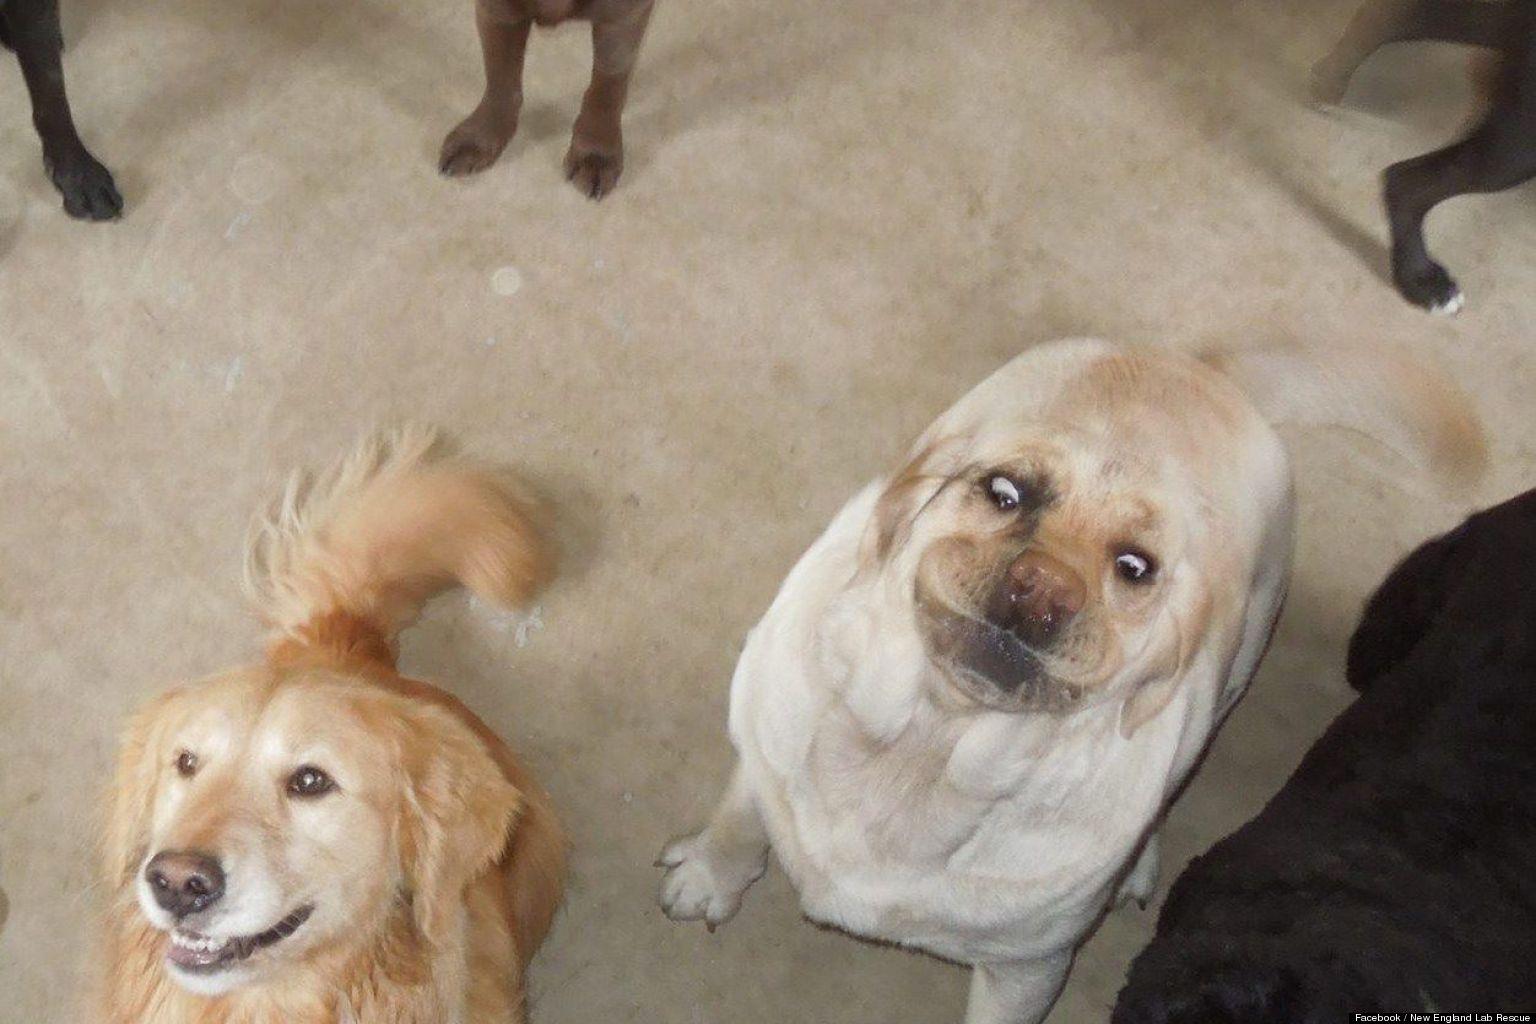 LOOK: Reddit's New Favorite Dog Is A 'Labra-derp'